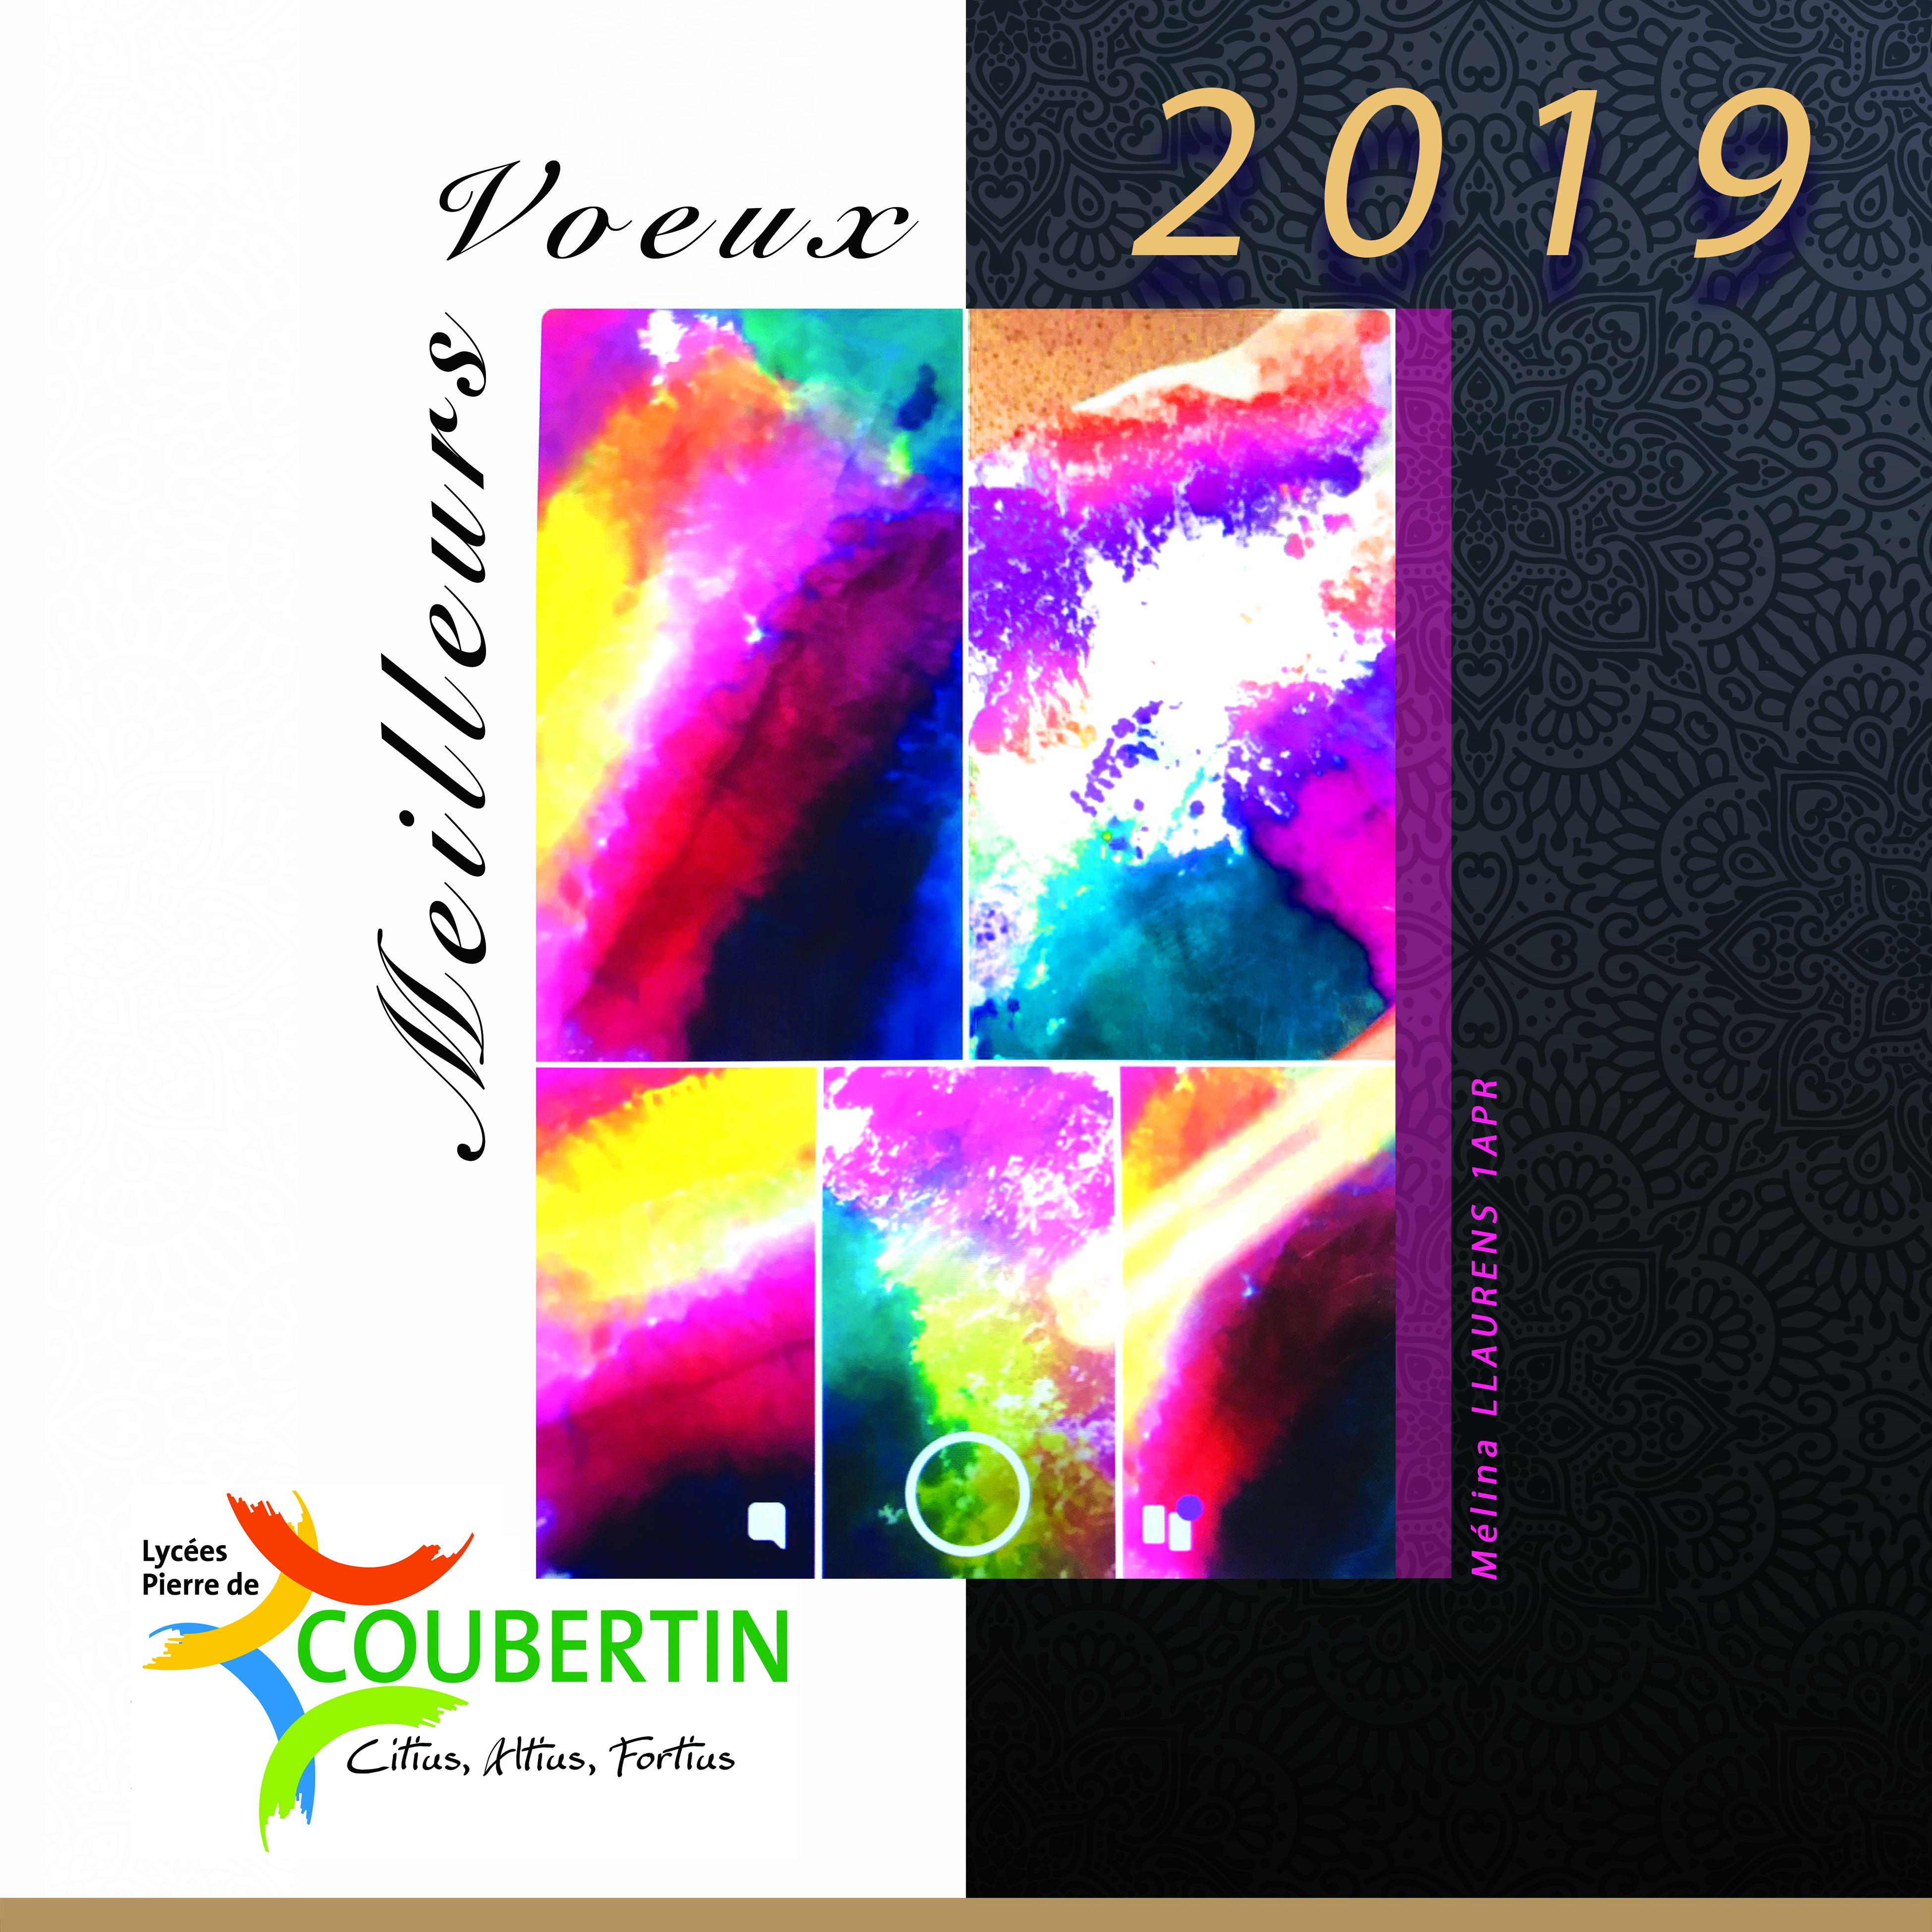 Voeux 2019_P Coubertin